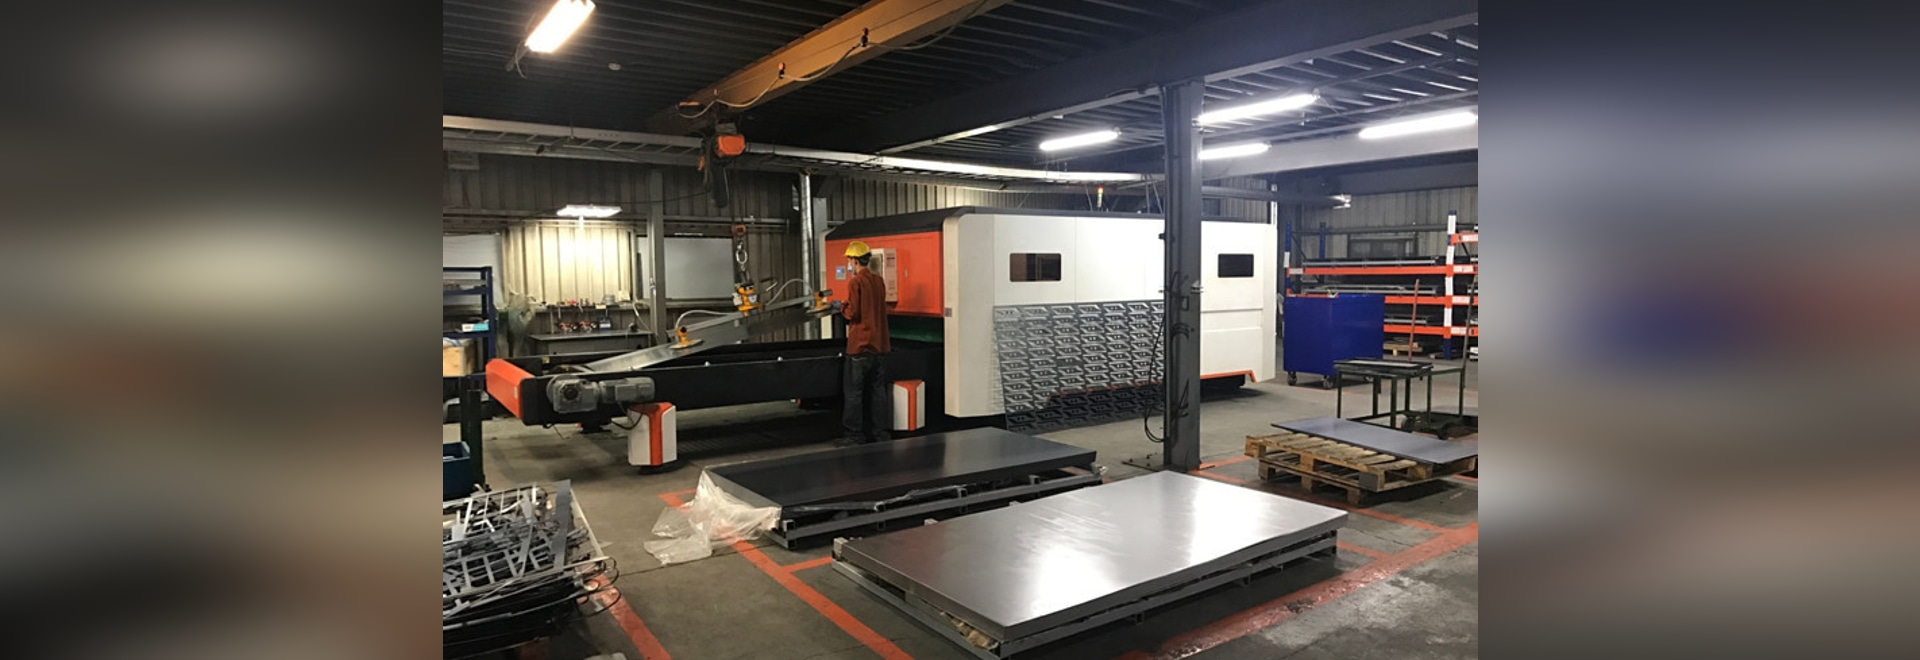 GF-1530JH Fiber Laser Cutting Machine For Metal Sheet / Plate In Taiwan Customer Site